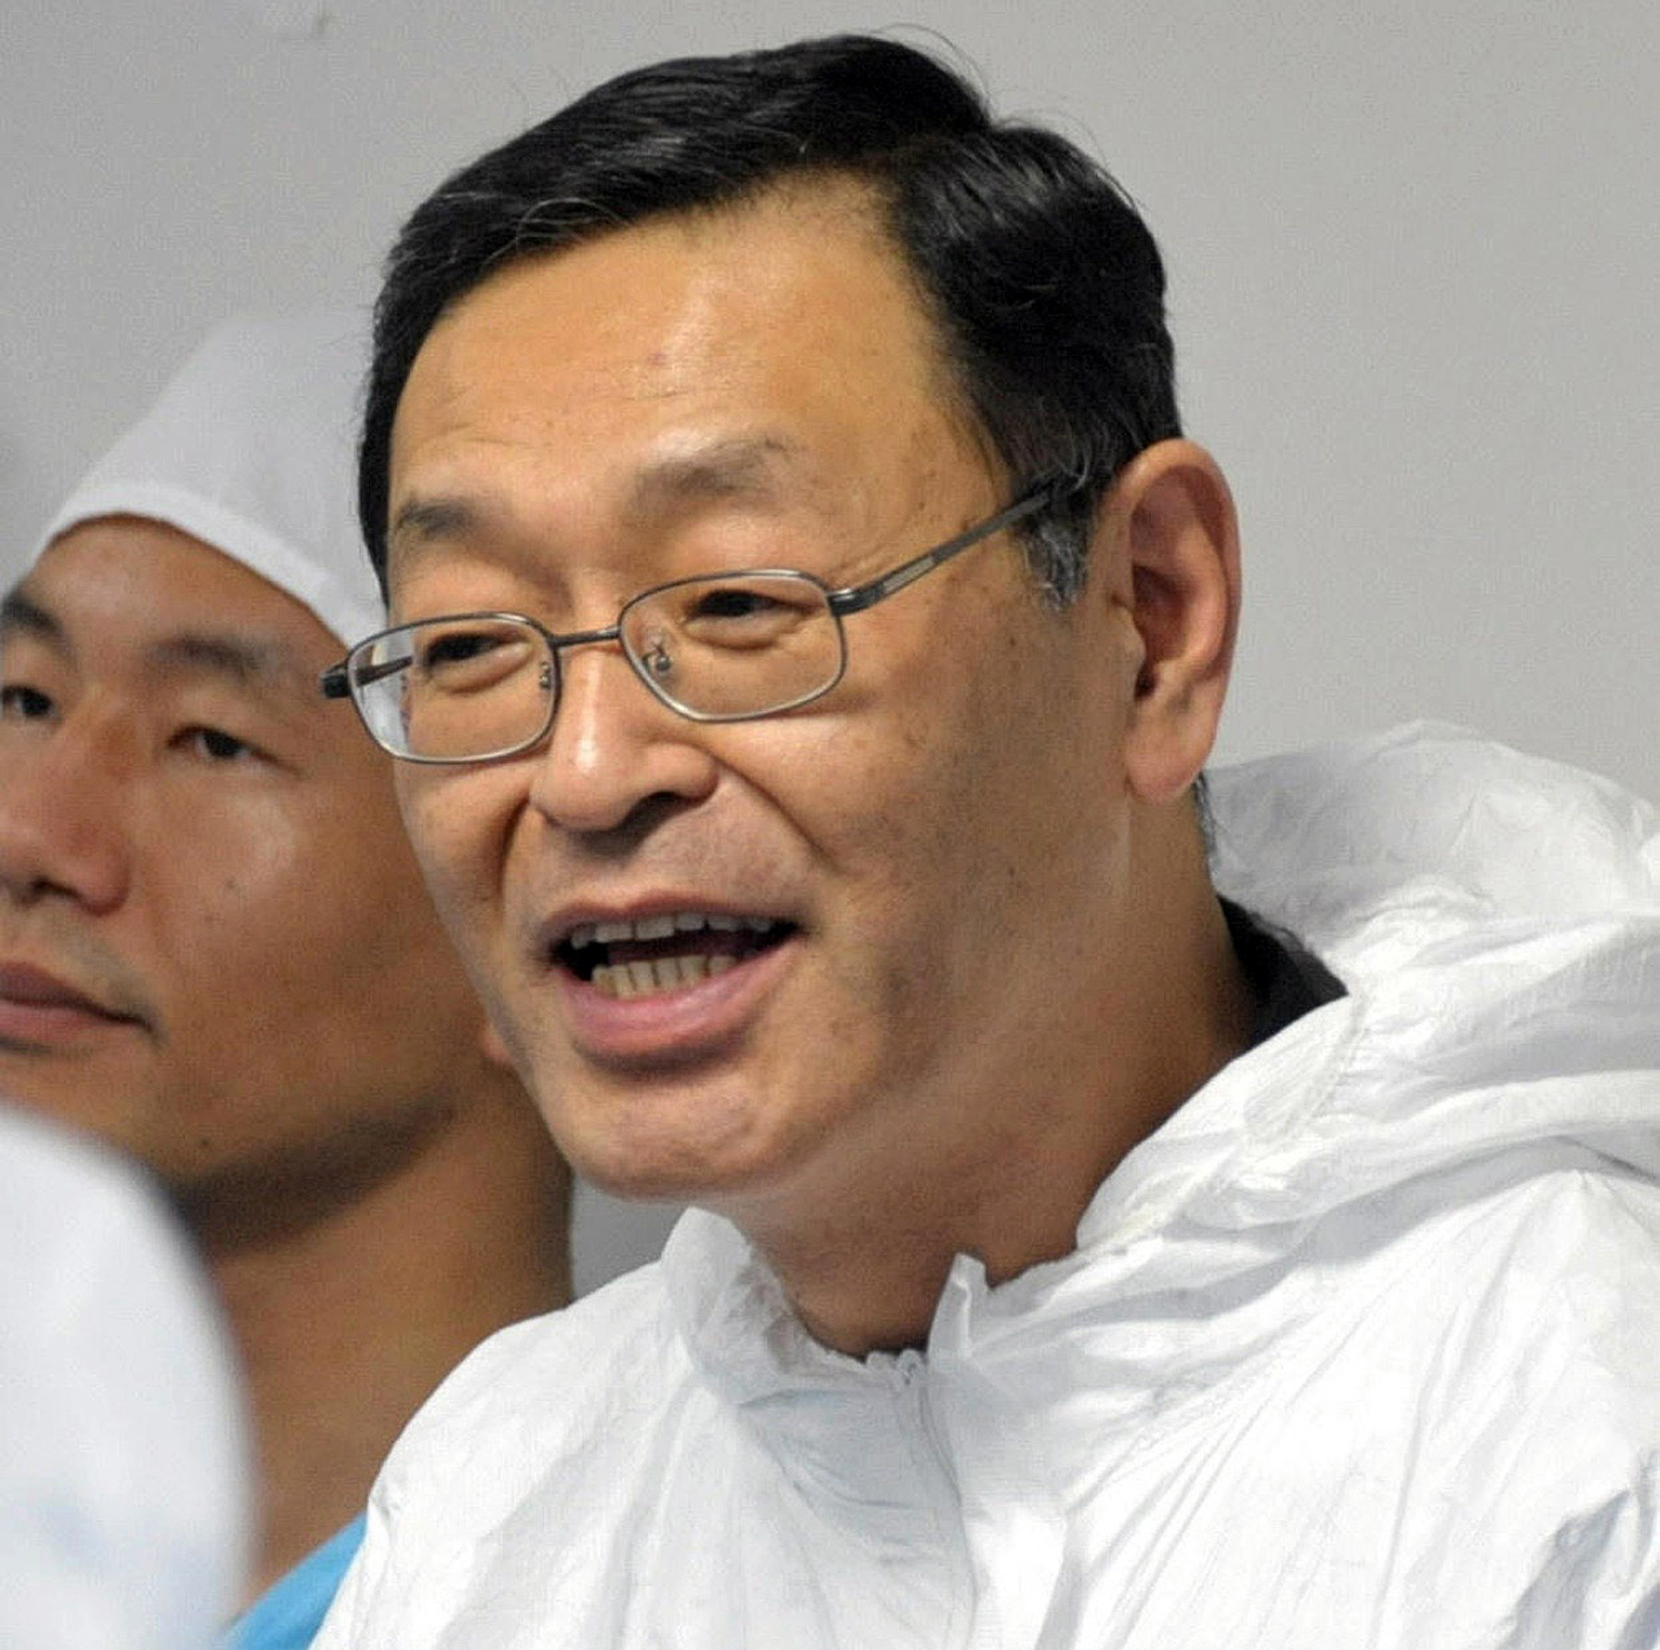 Minbiziz hil da Masao Yoshida, Fukushima Daiichiko zuzendaria